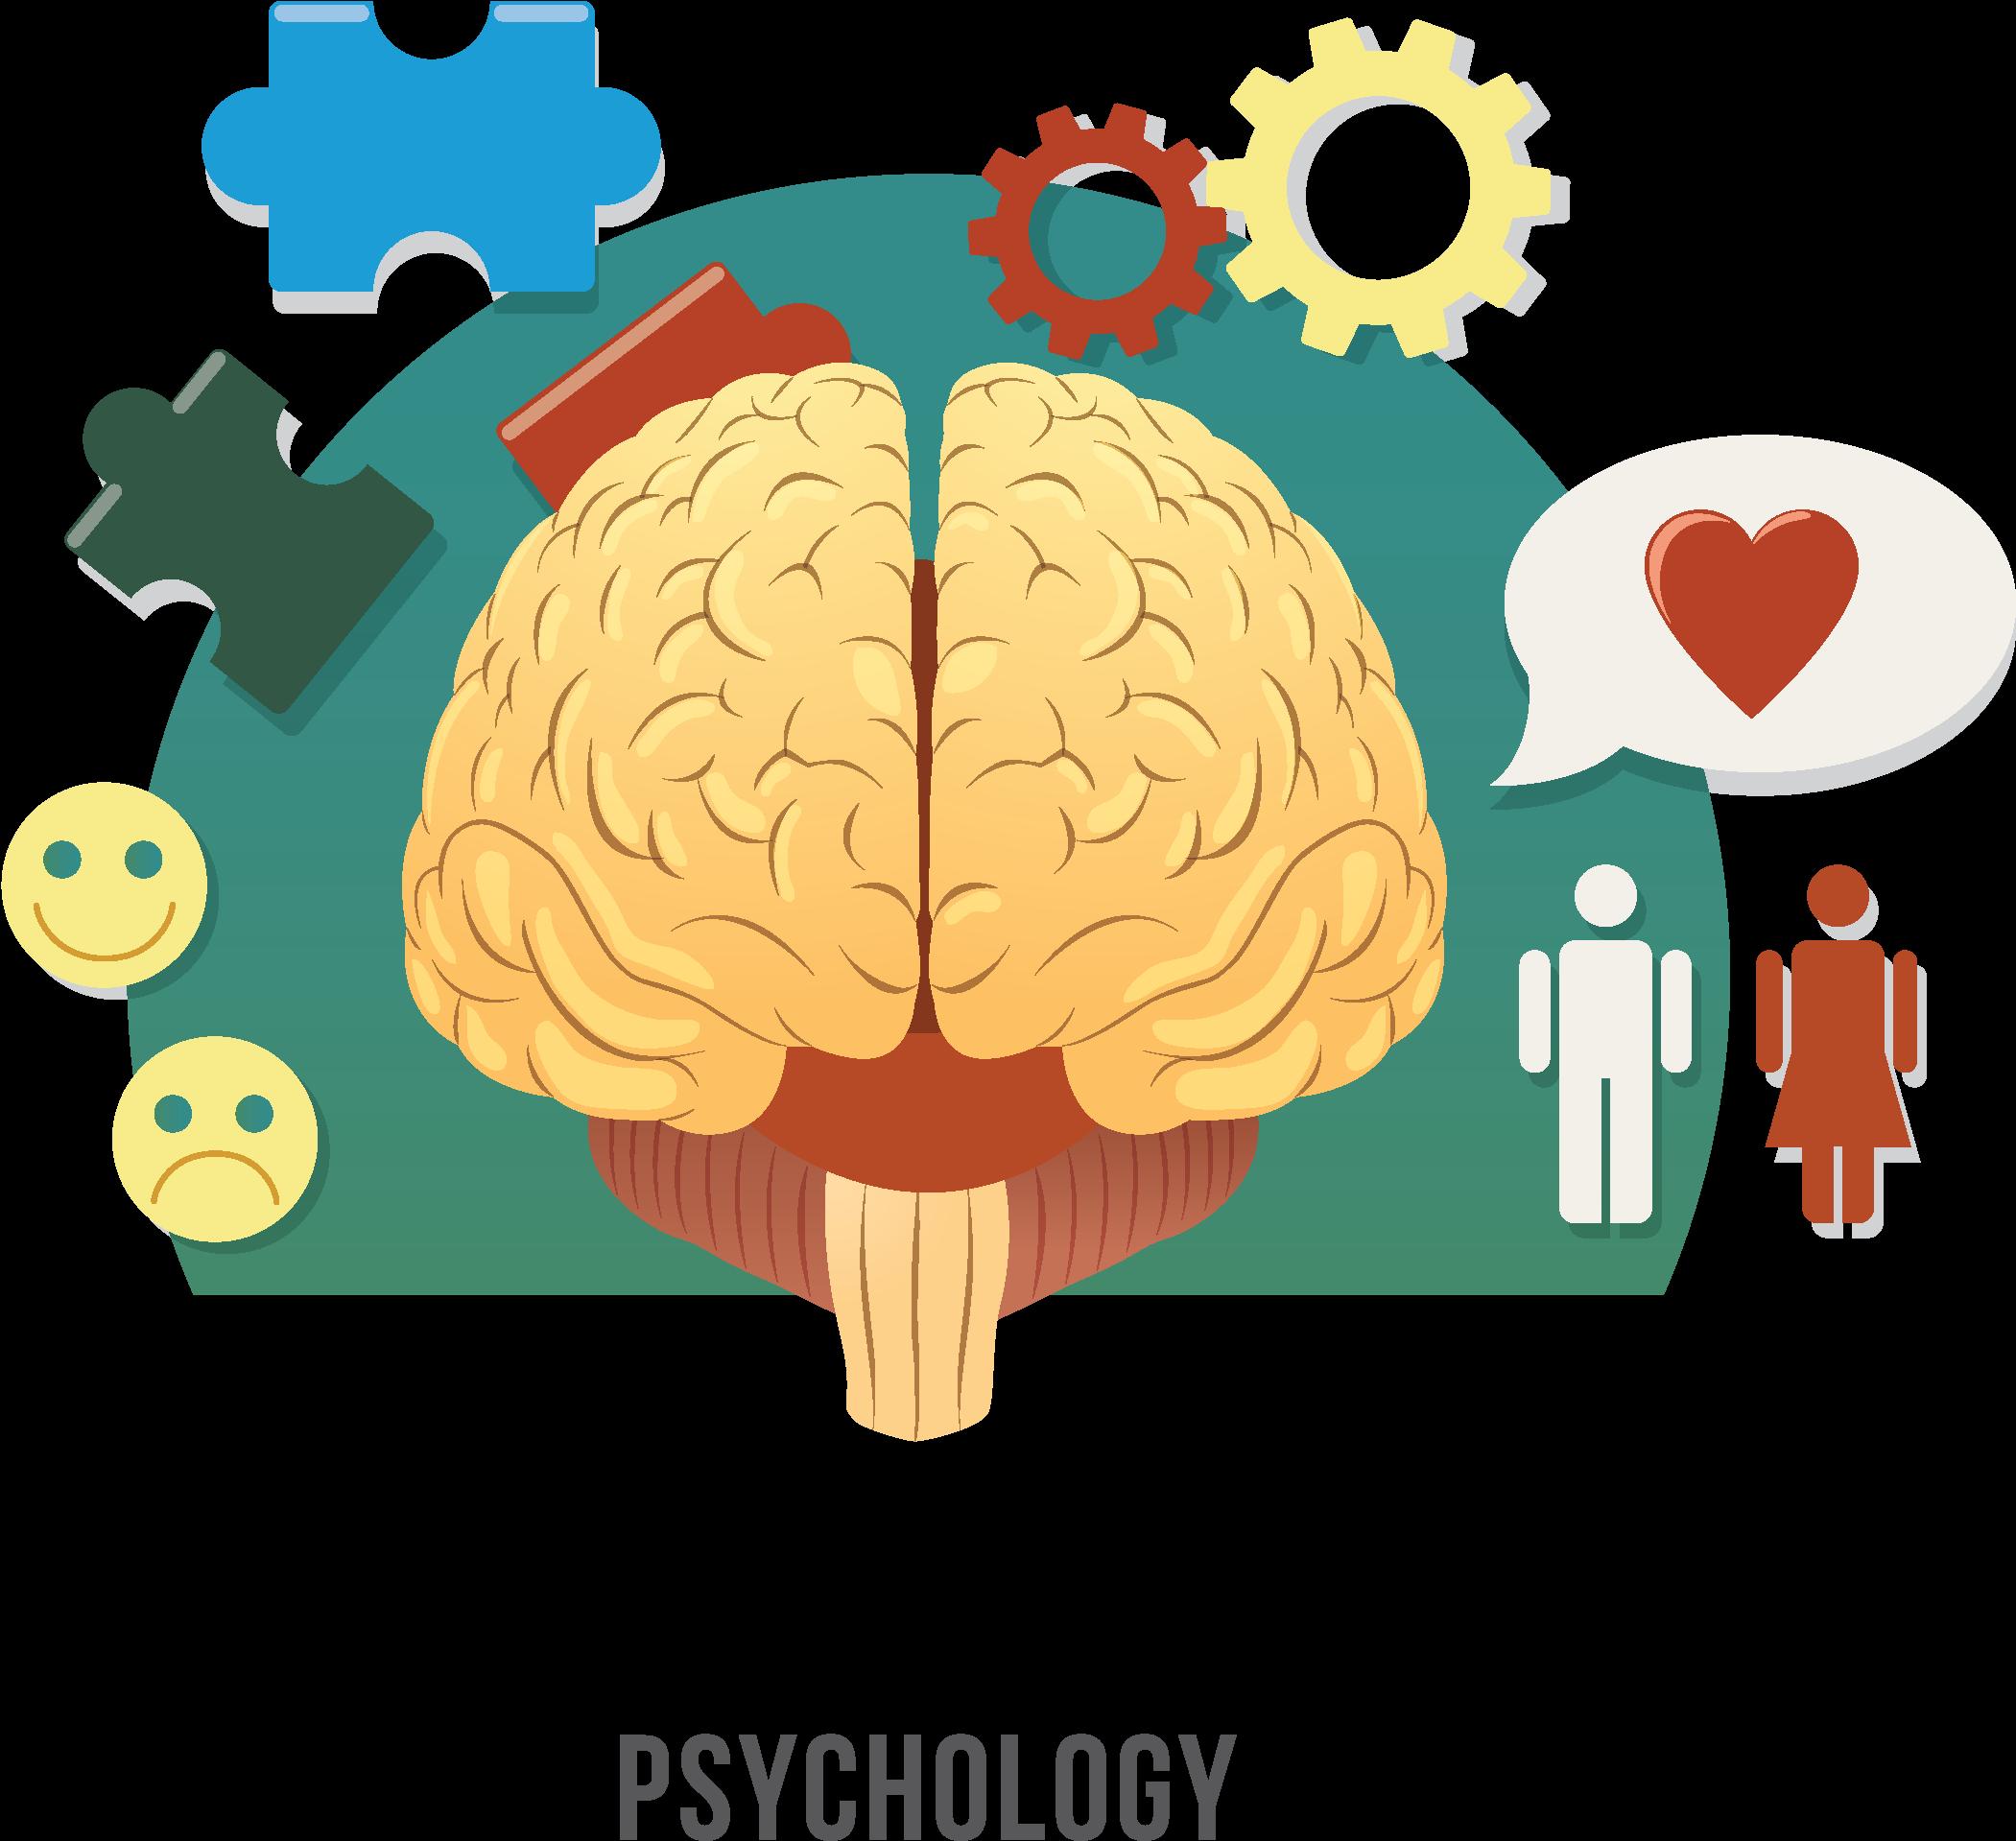 Transparent brain clipart - Psychology Clipart Human Brain - Clinical Psychologist